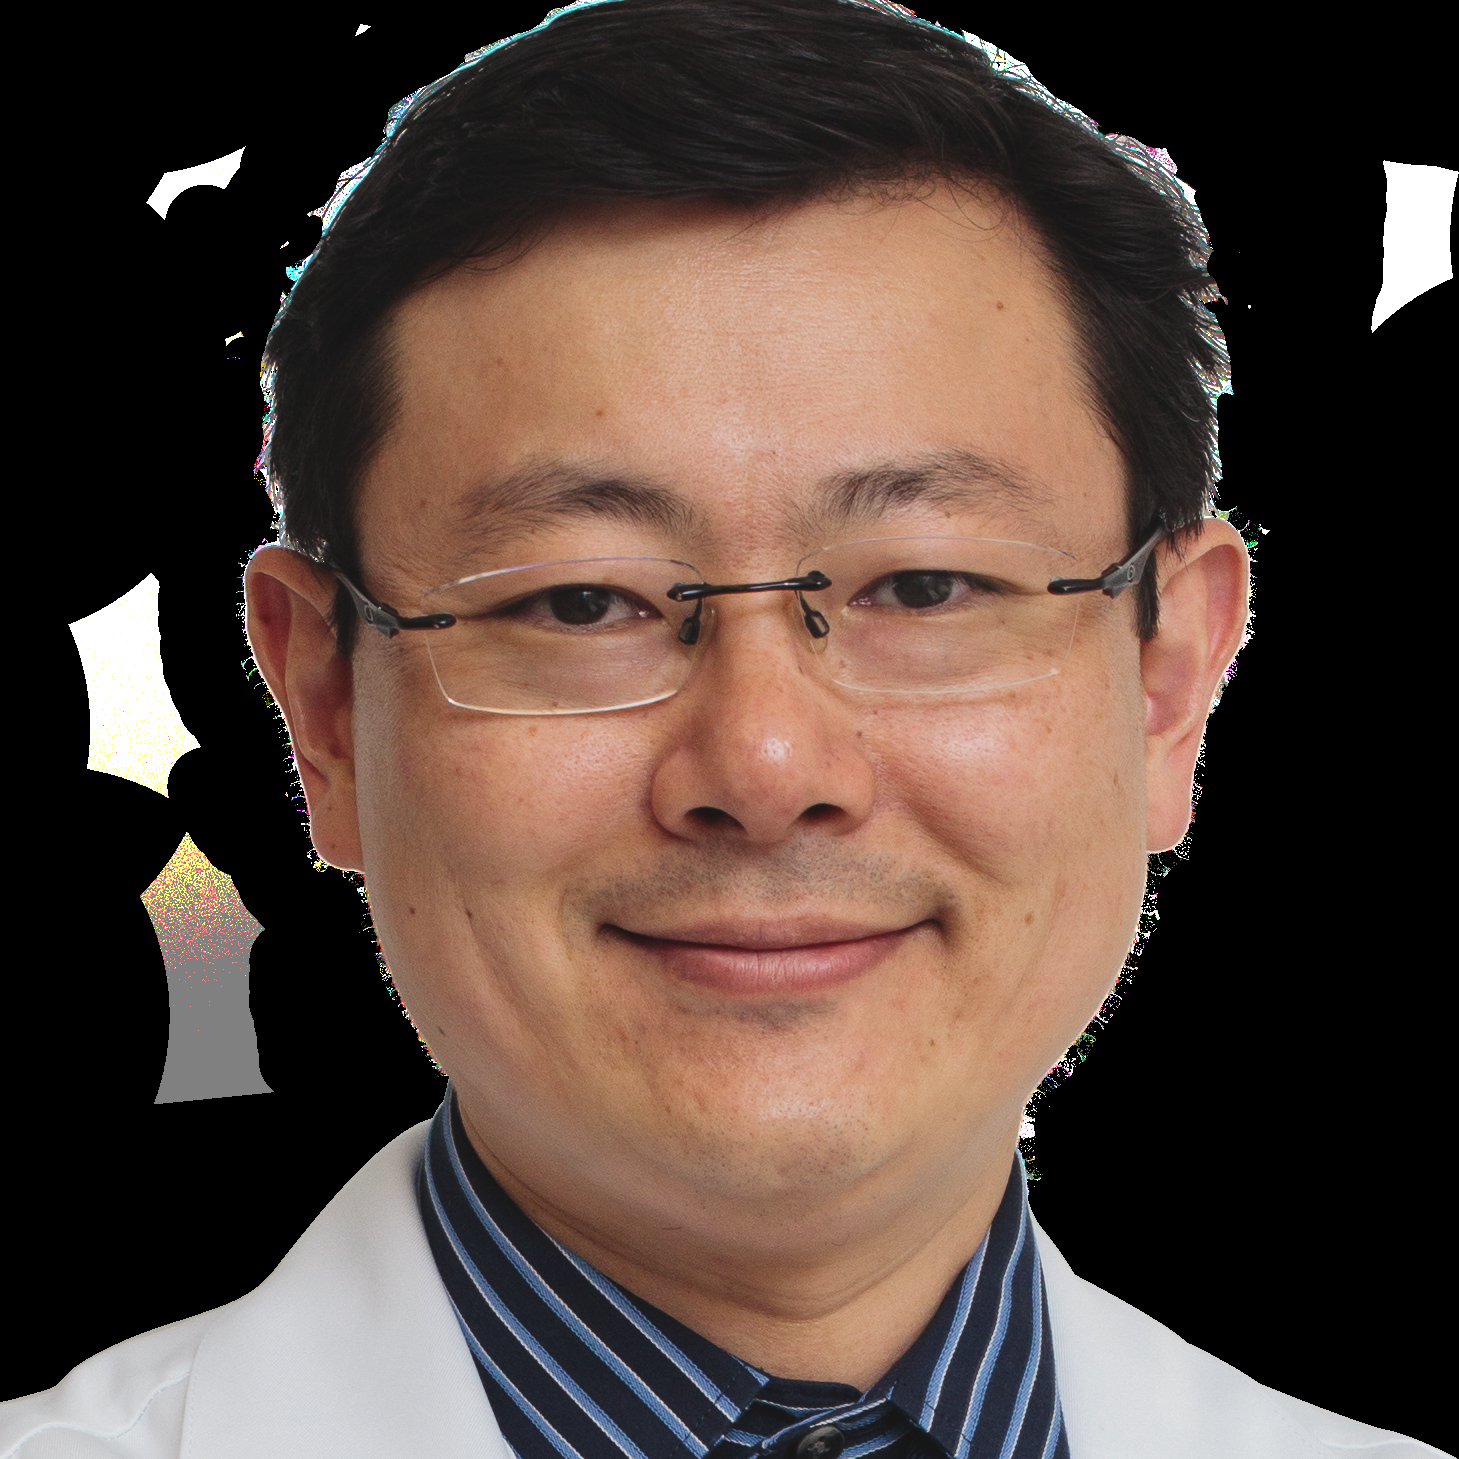 Marcelo Yuji Cinagava